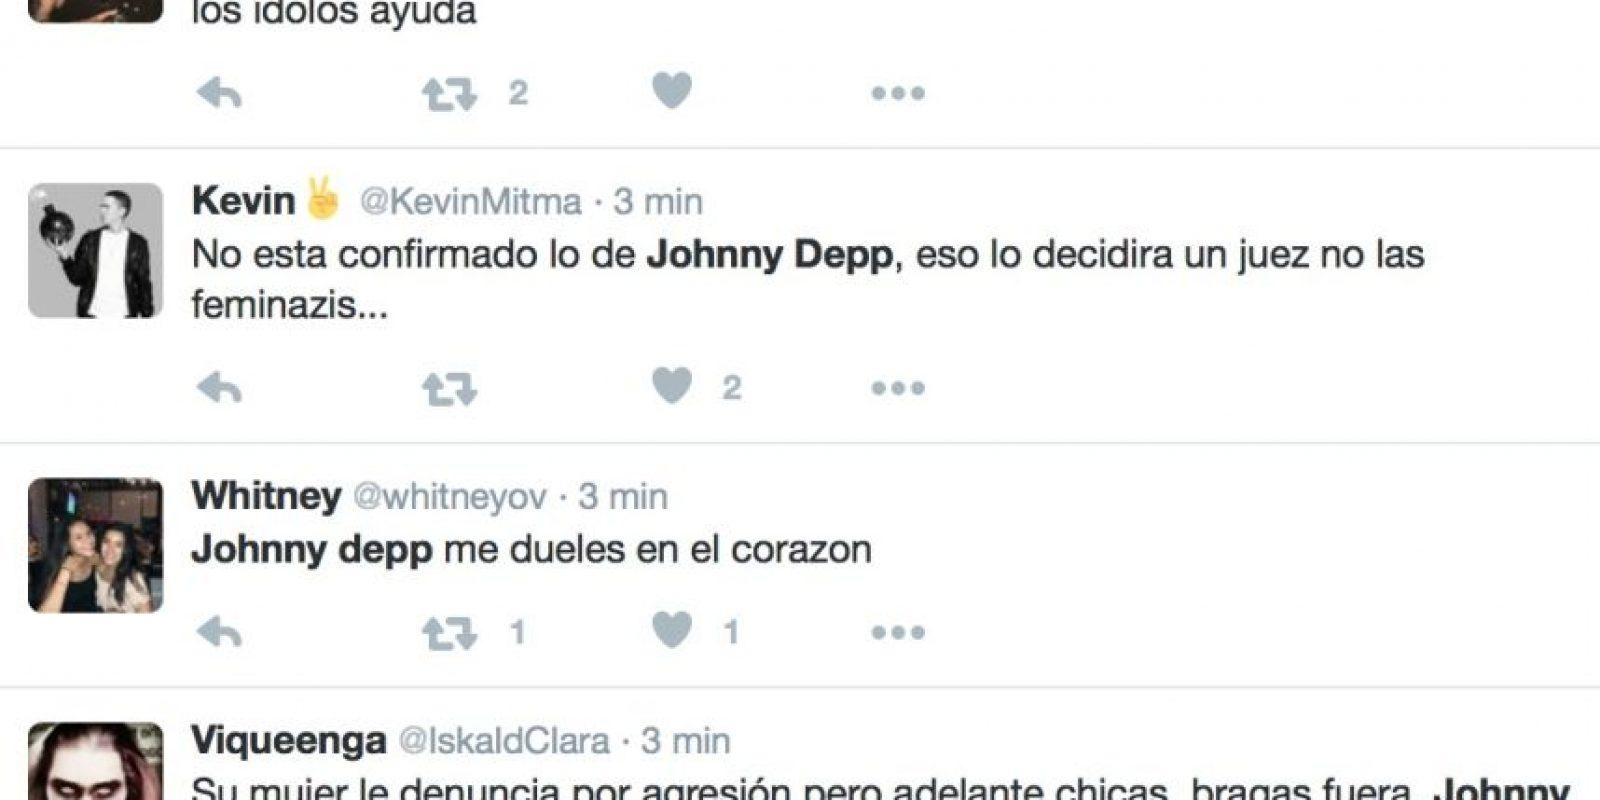 Así reaccionó Twitter tras saber que Johnny Depp golpeaba a Amber Foto:Twitter